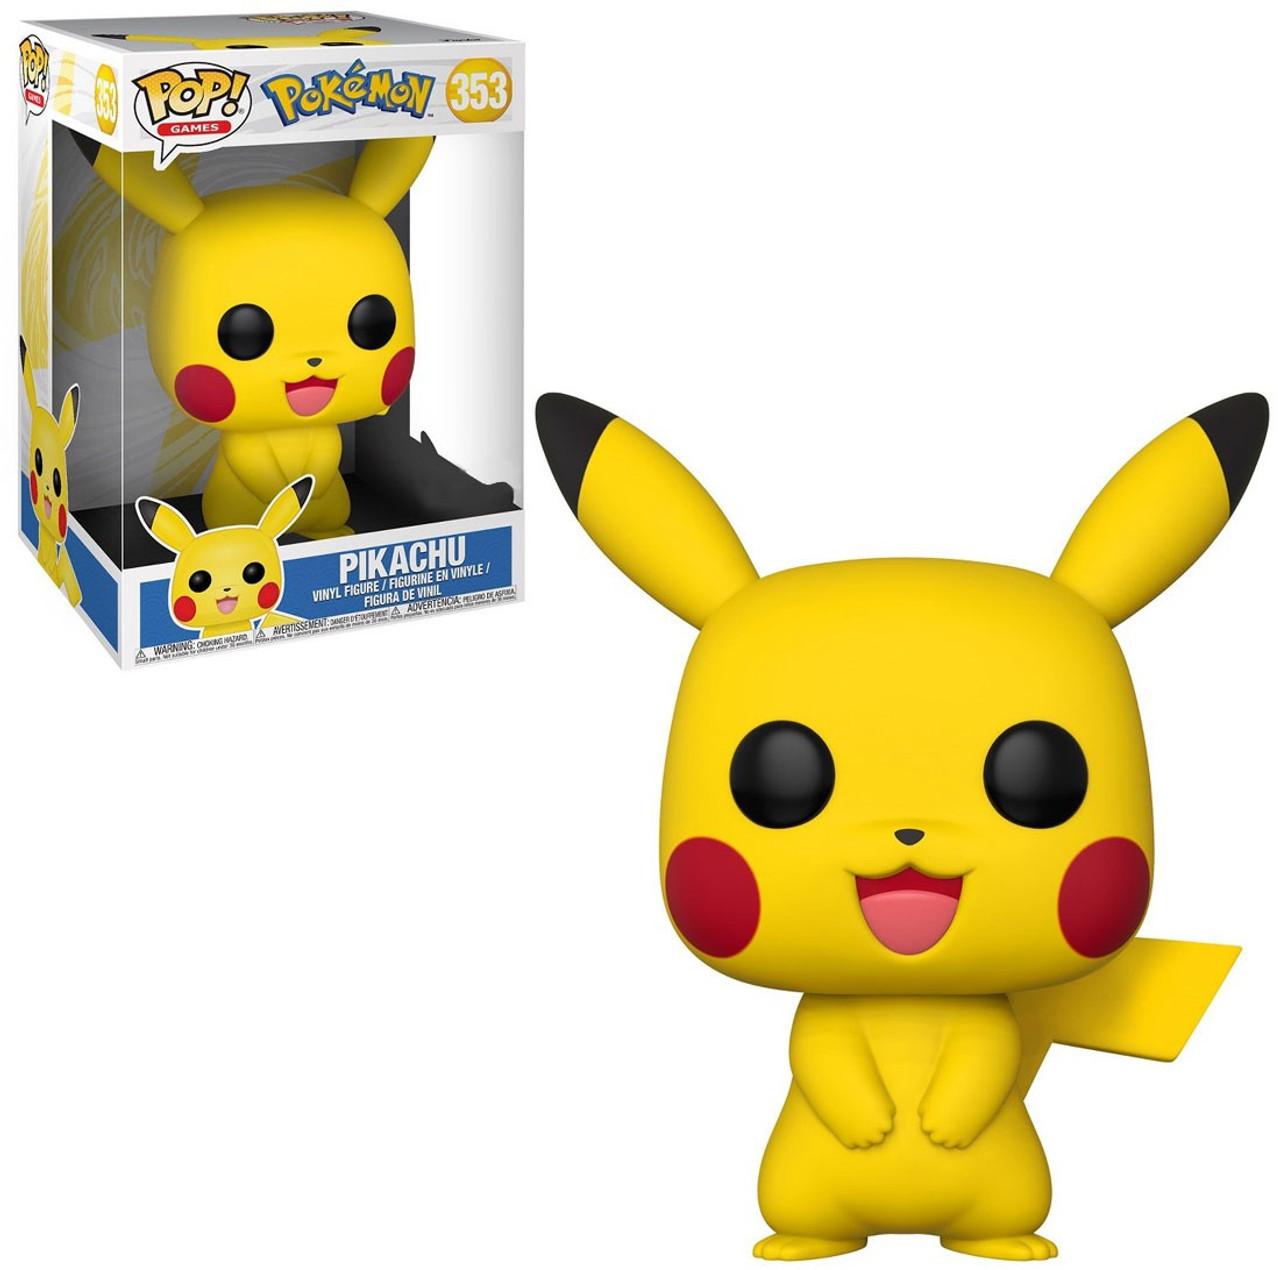 Funko Pokemon Pop Games Pikachu Exclusive 10 Vinyl Figure 353